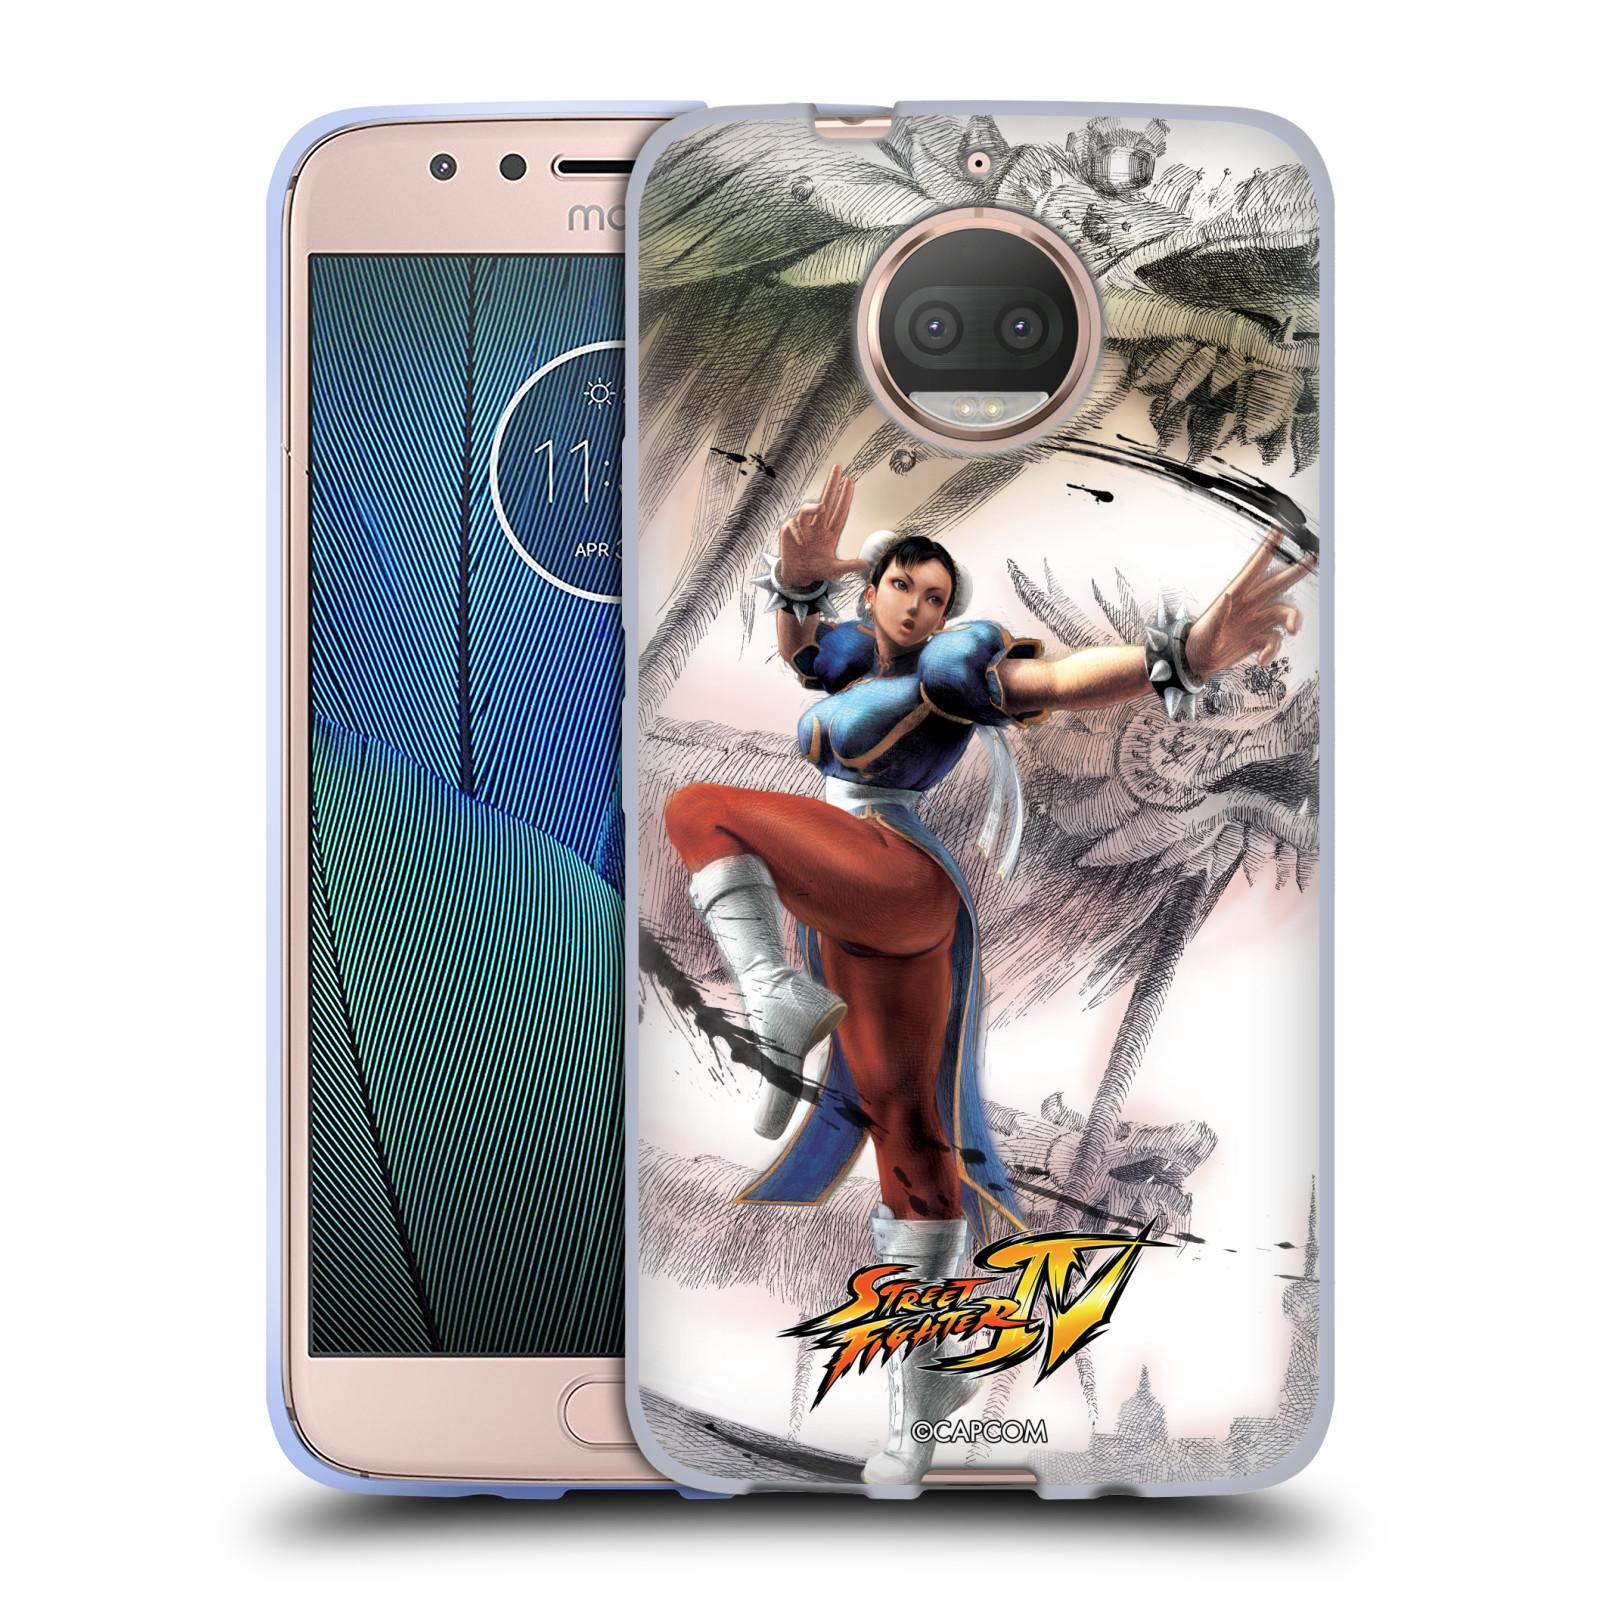 HEAD CASE silikonový obal na mobil Lenovo Moto G5s PLUS oficiální kryt STREET FIGHTER bojovnice Chun-Li kresba